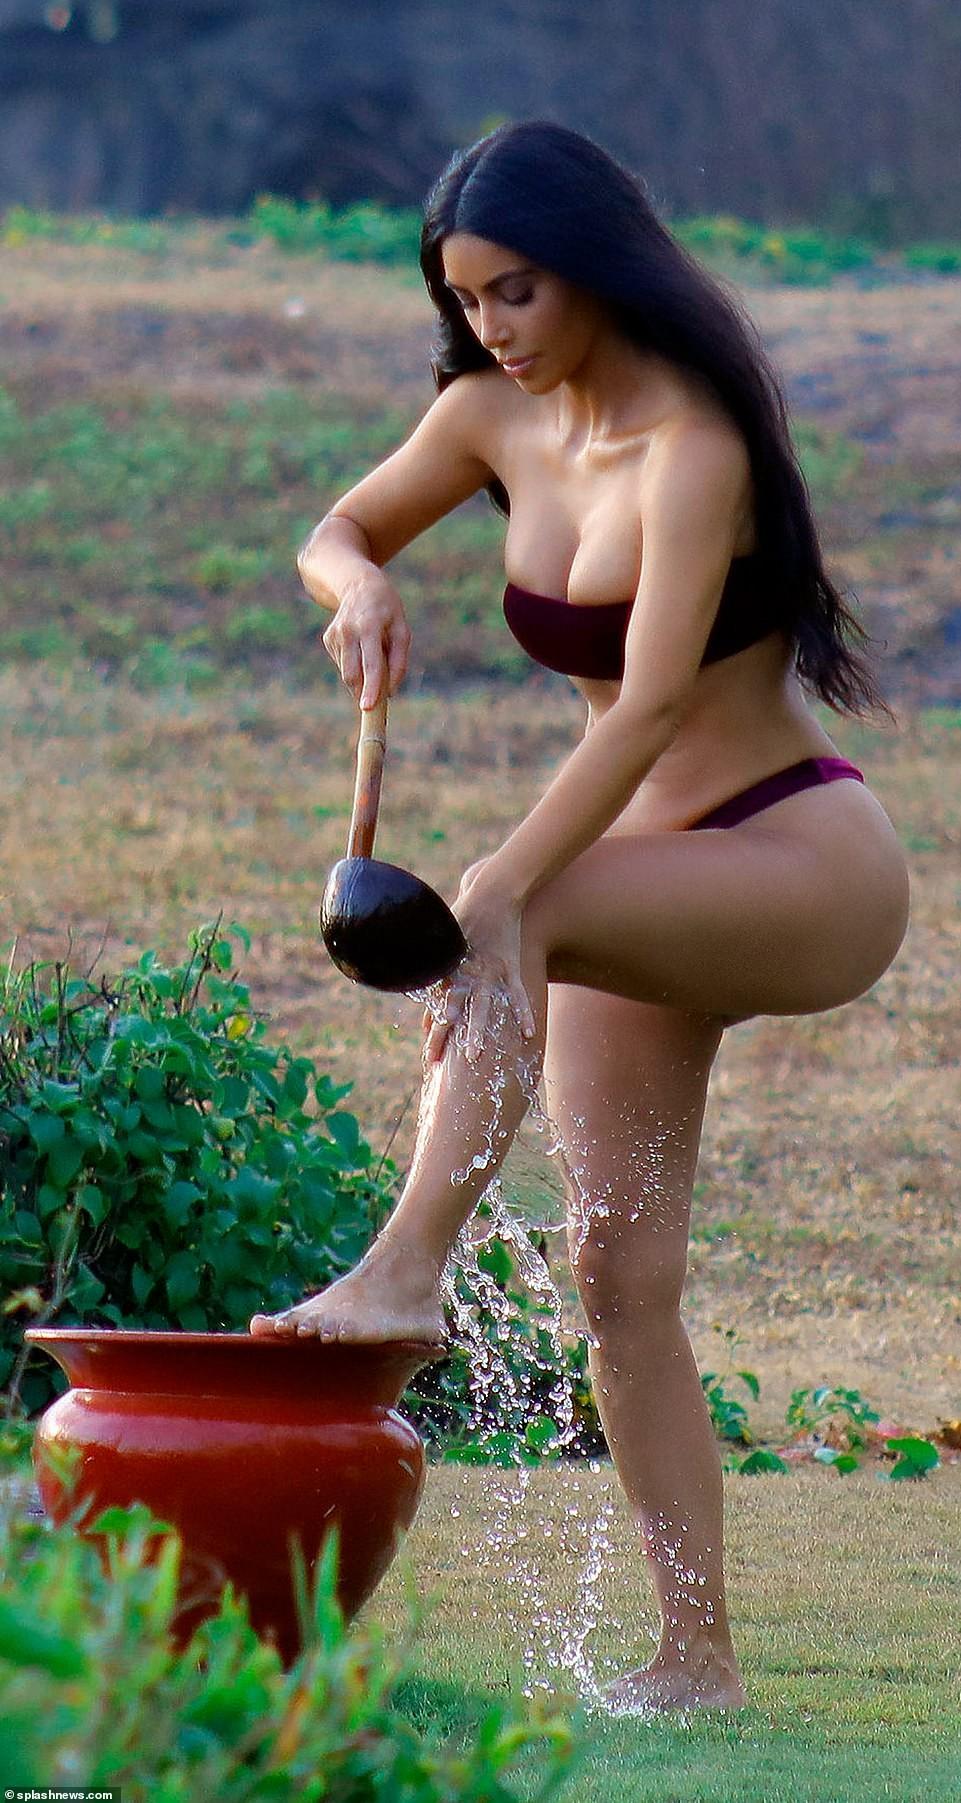 Bikini-clad Kim Kardashian flaunts her eye-popping figure in new photoshoot (Photos)